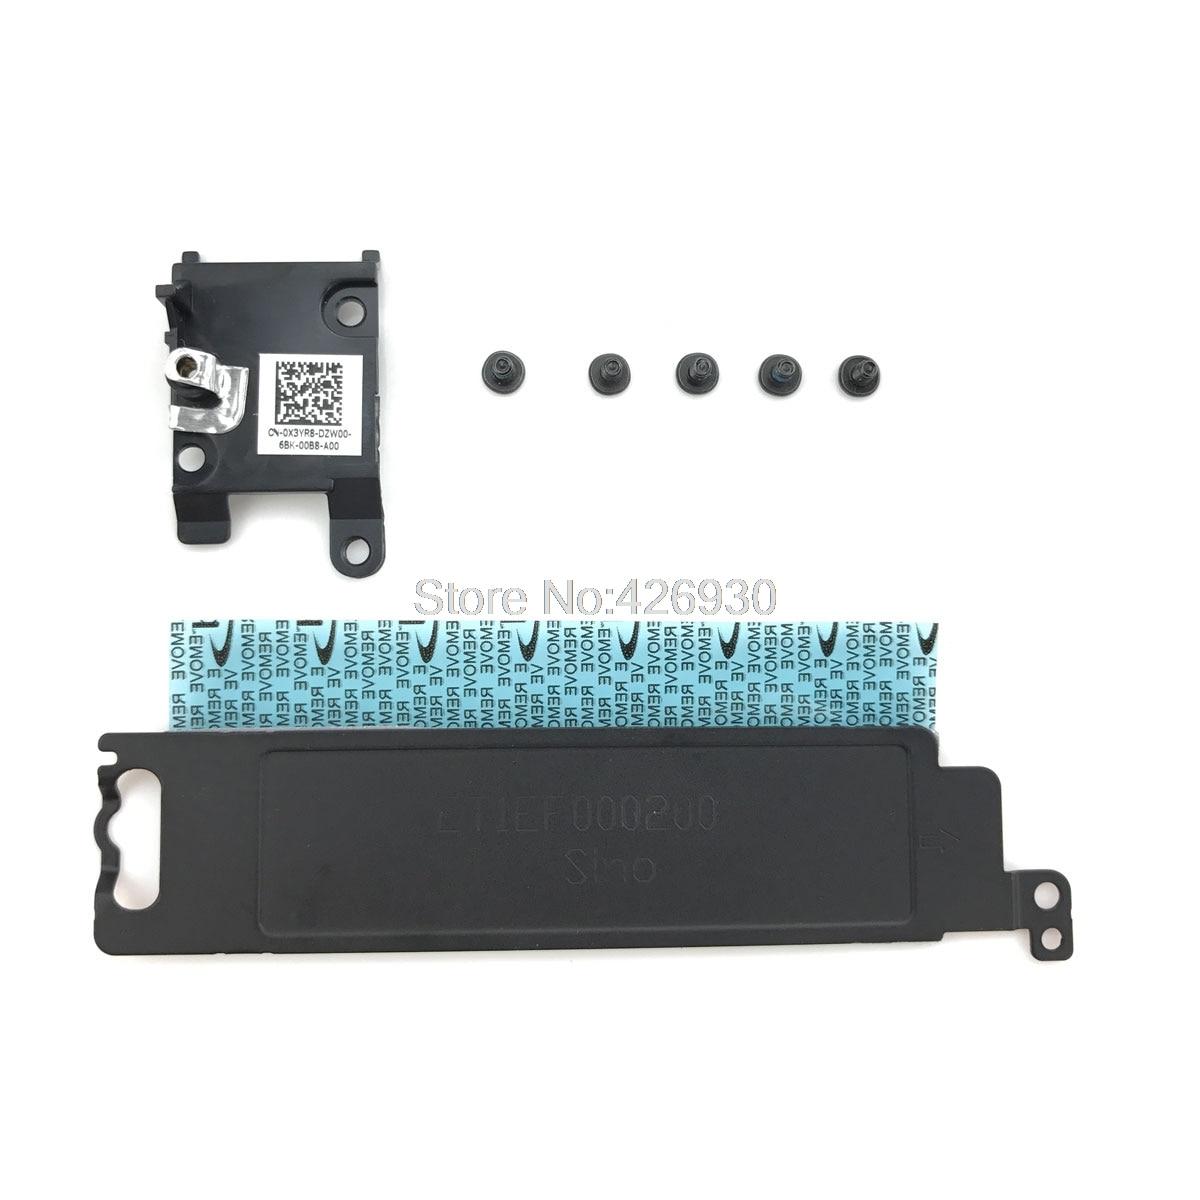 Laptop Plate Bracket SSD Frame For DELL For Latitude E5270 E5470 E5570 M3510 0X3YR8 X3YR8 01X2MT 1X2MT M.2 SSD Caddy New